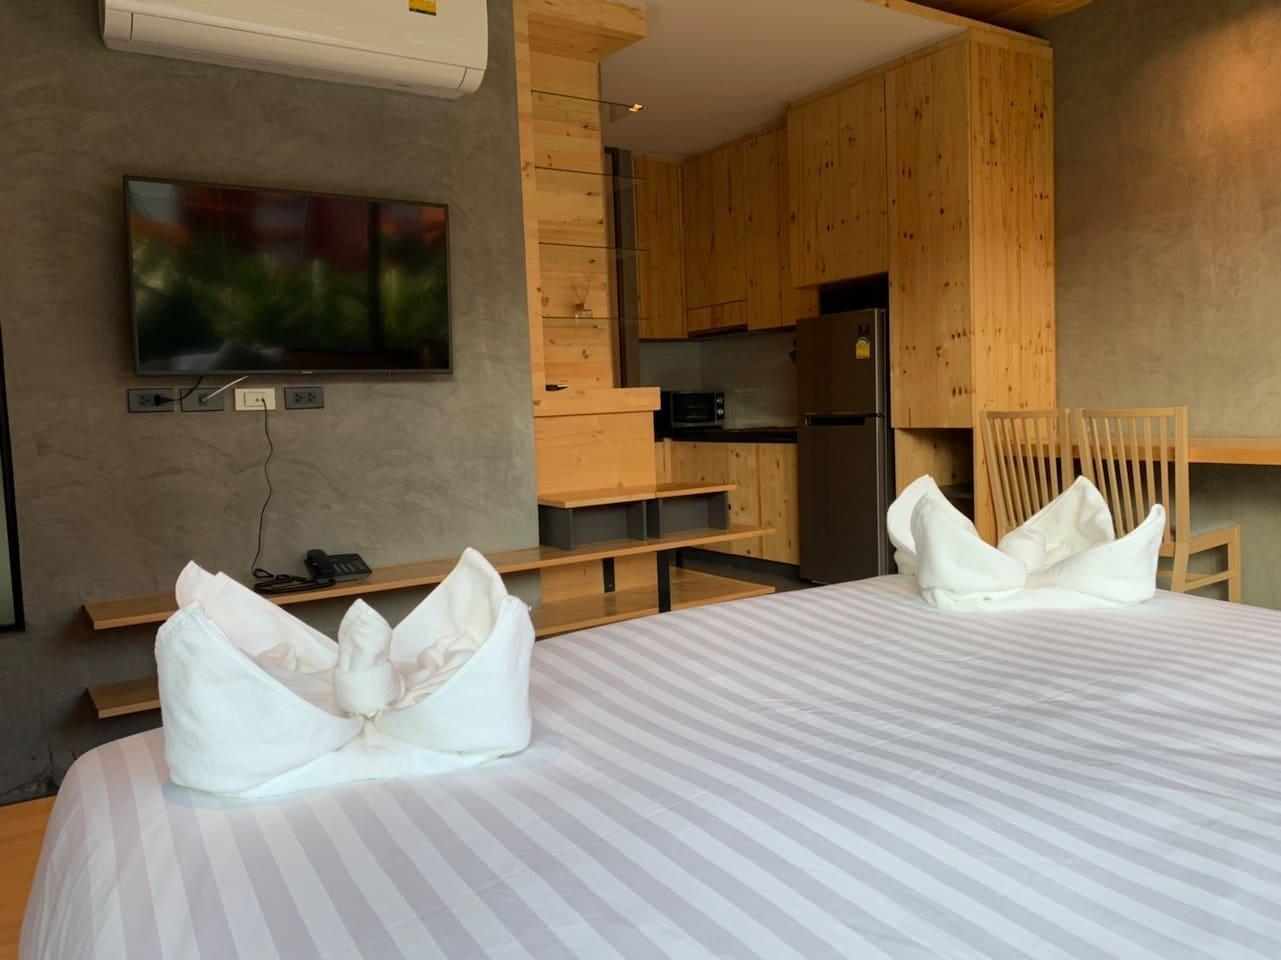 Nai Harn beach holiday@the windy 2 อพาร์ตเมนต์ 1 ห้องนอน 1 ห้องน้ำส่วนตัว ขนาด 30 ตร.ม. – ในหาน